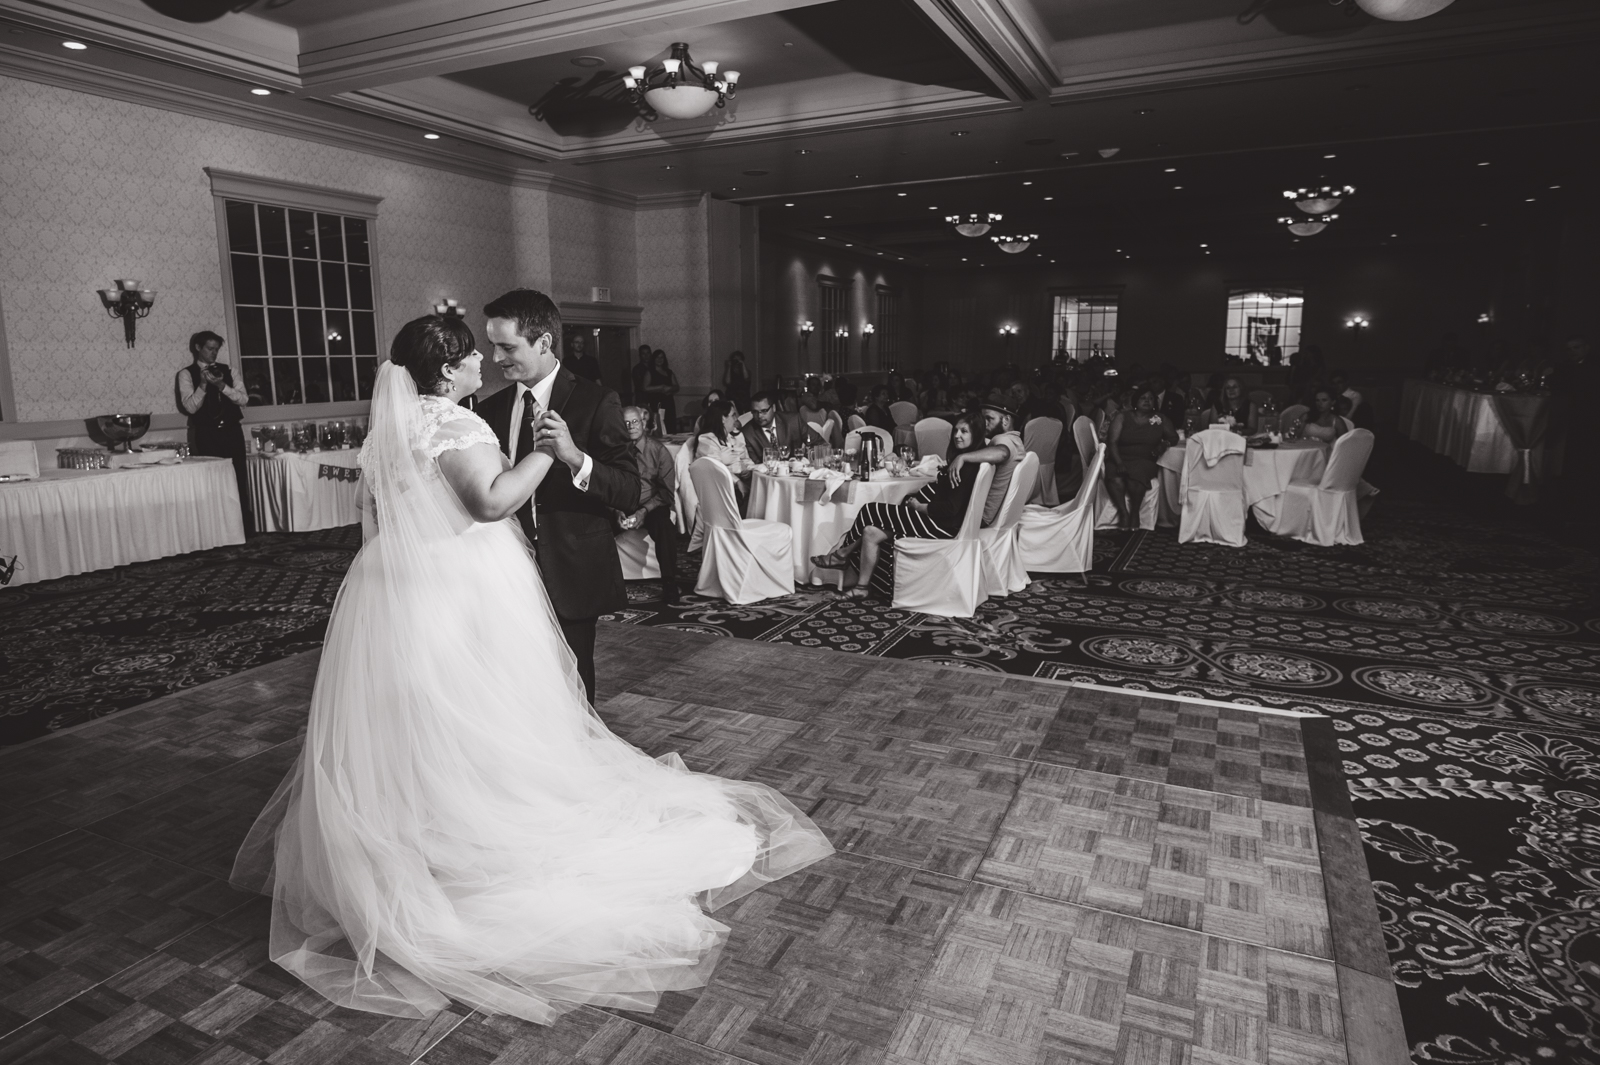 bc-wedding-photographers-harrison-lake-wedding-67.jpg